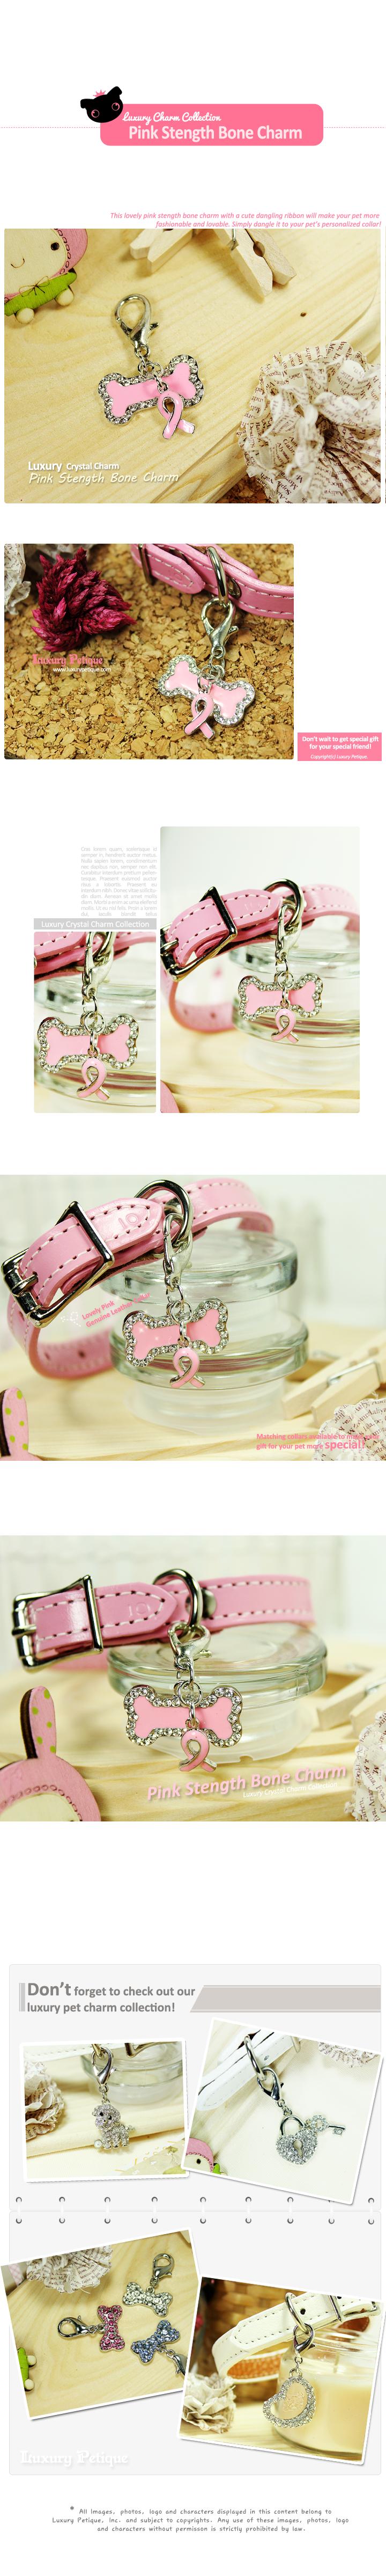 pink-stength.png